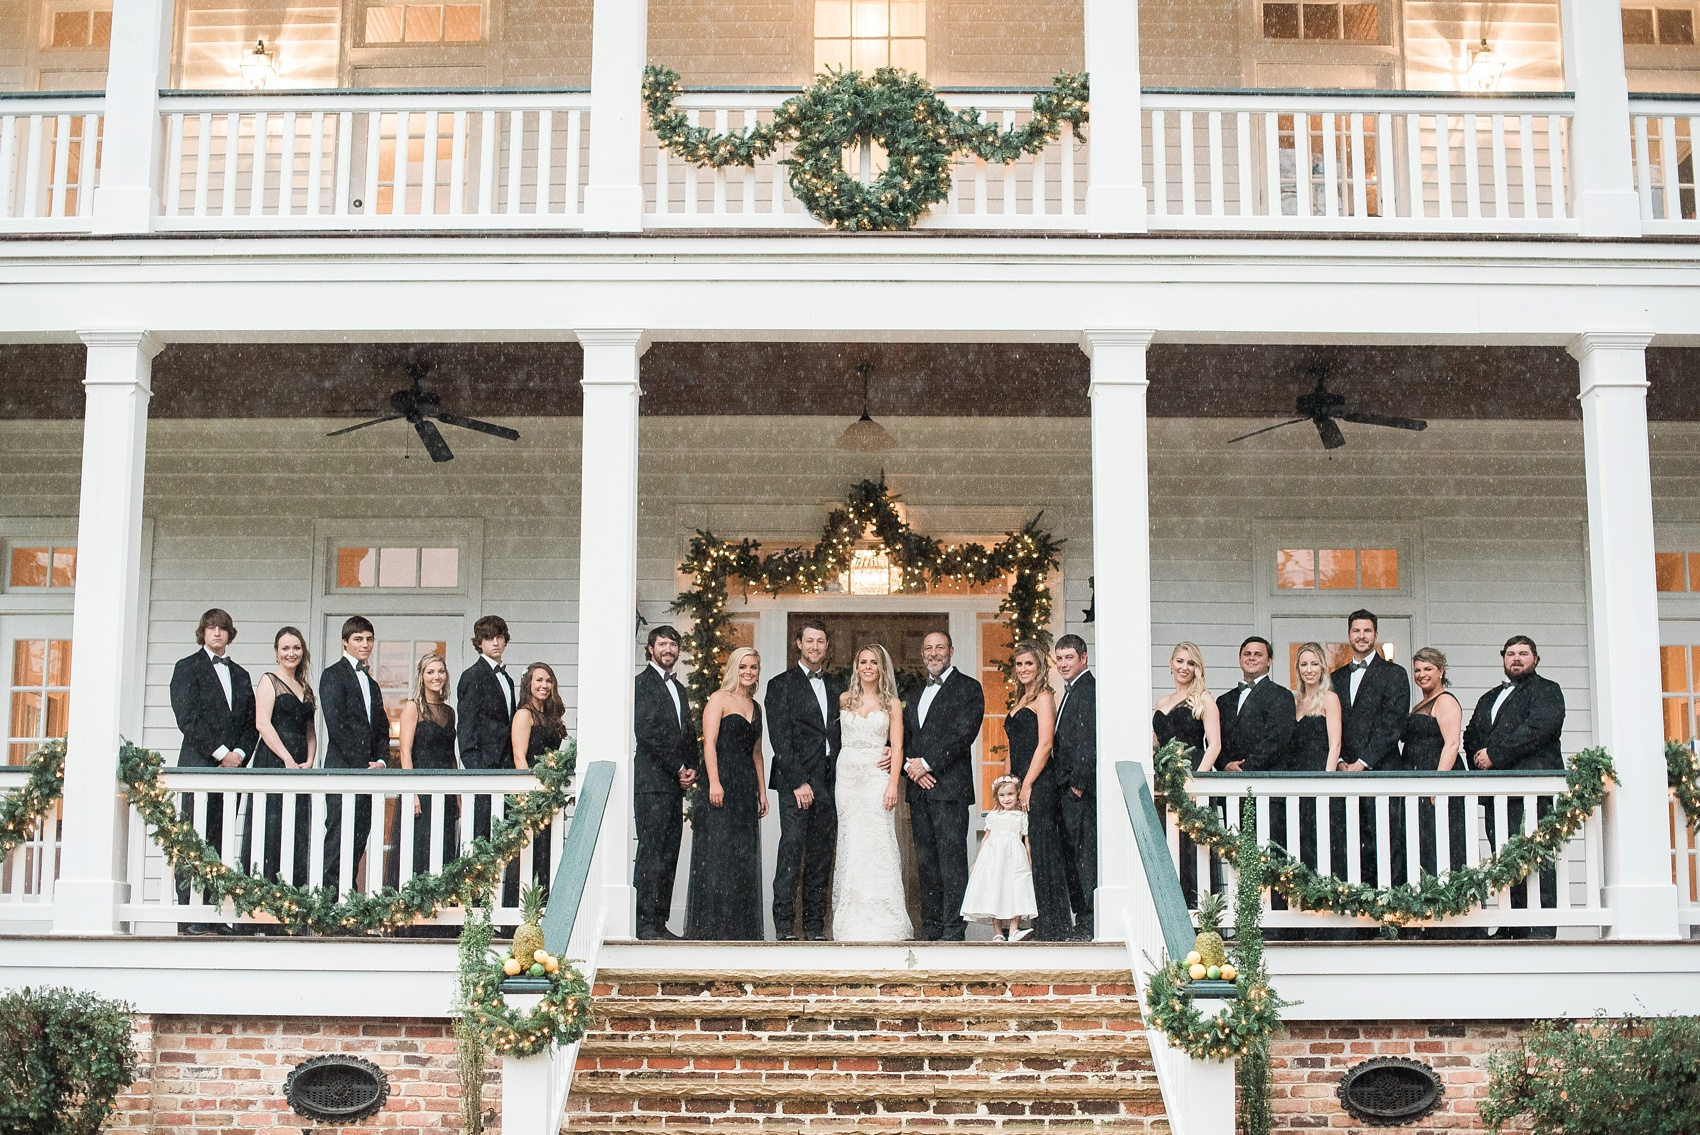 South_carolina_wedding_photographer_0051.jpg